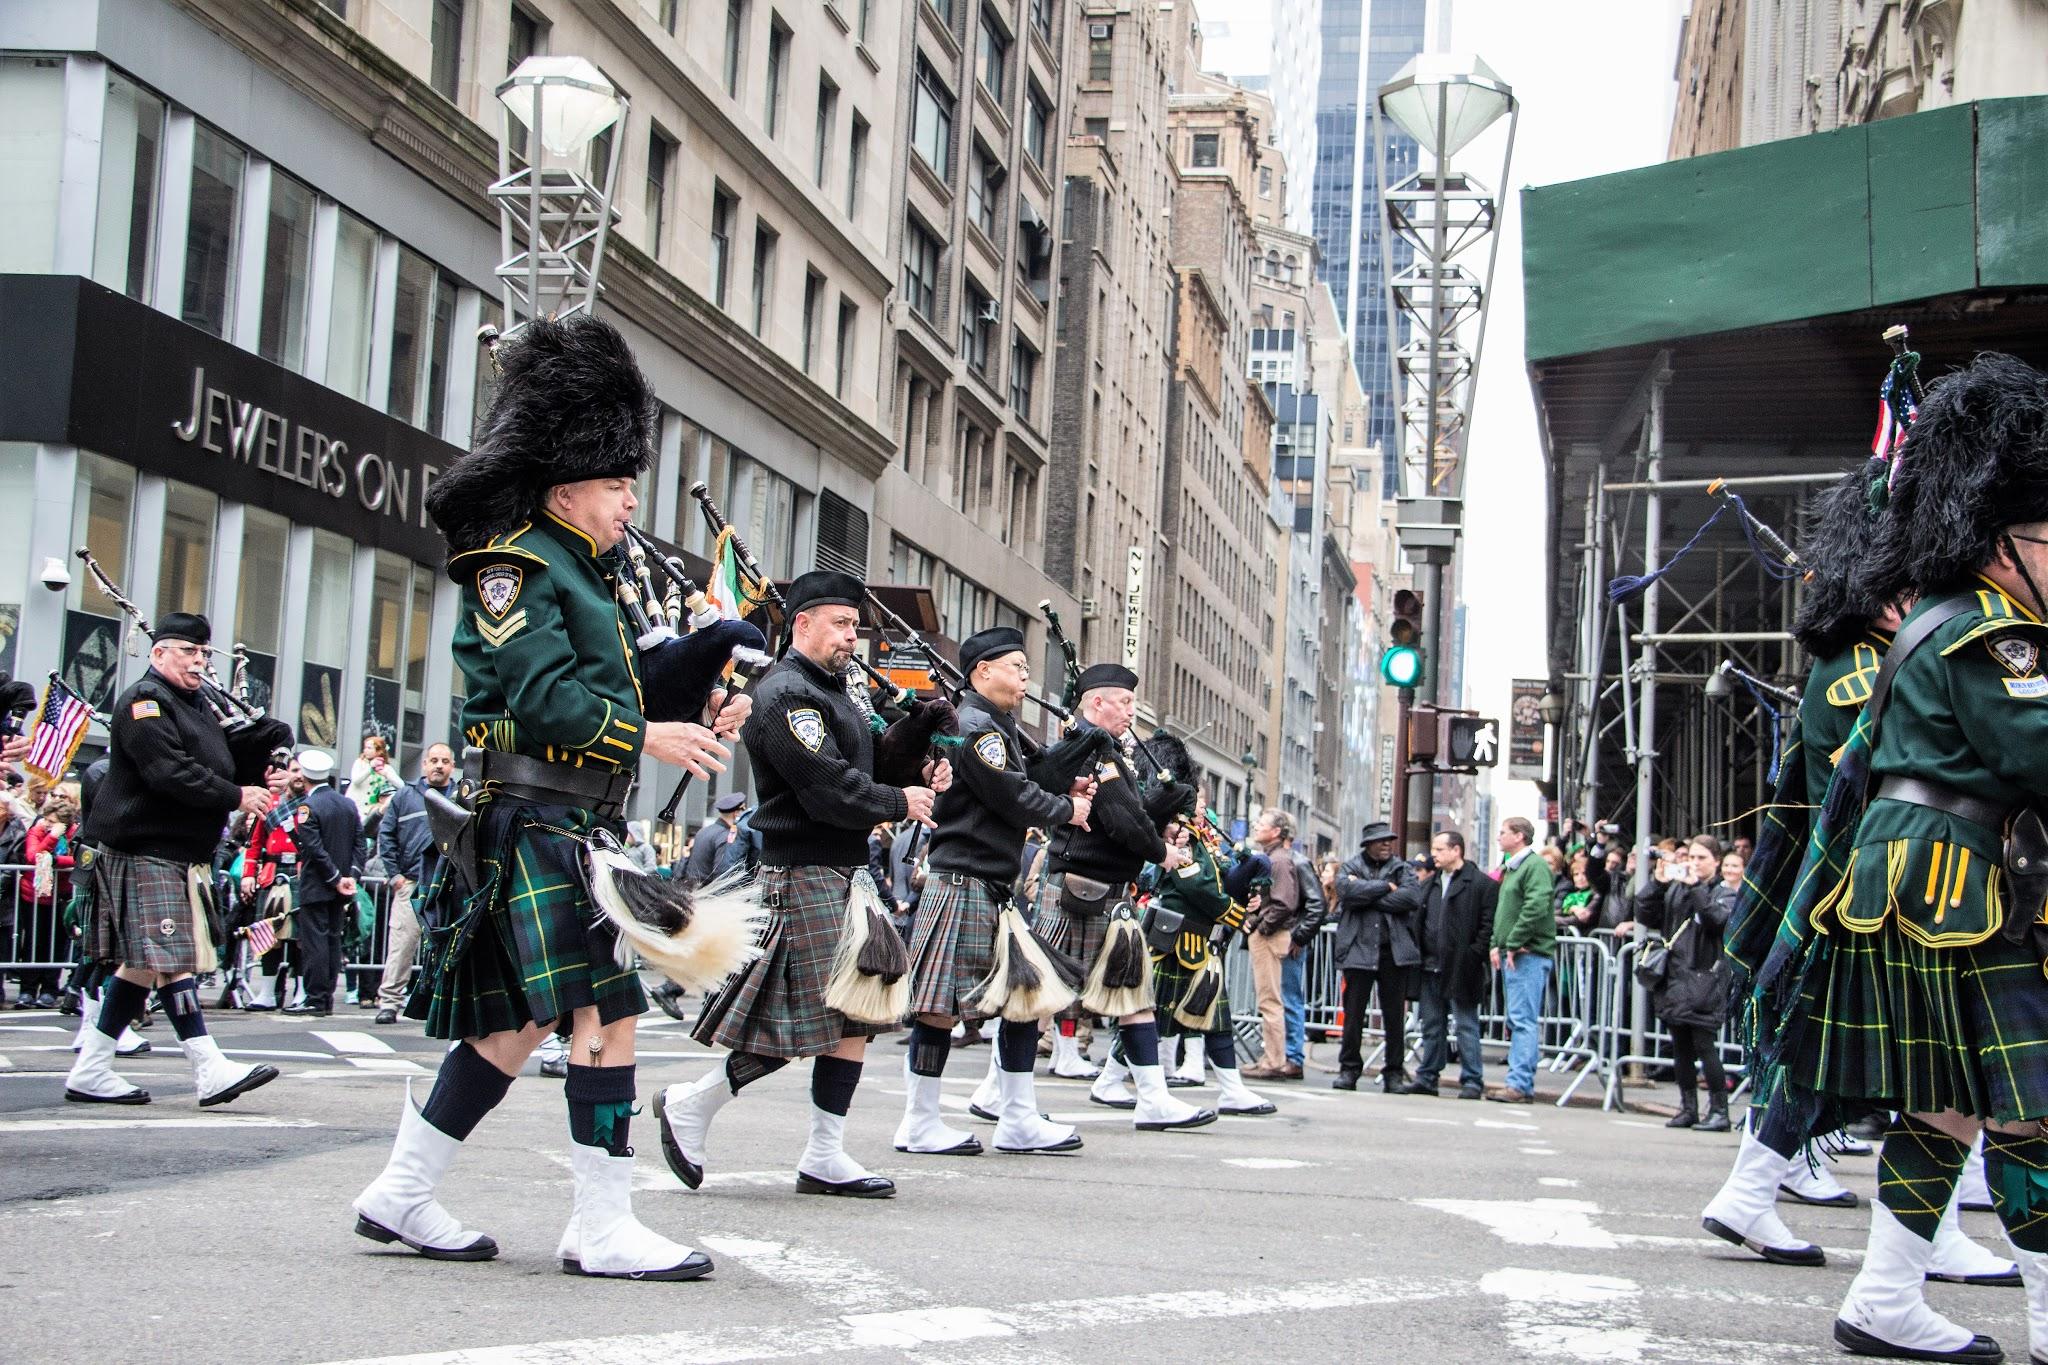 St. Patrick's Day New York City 2015